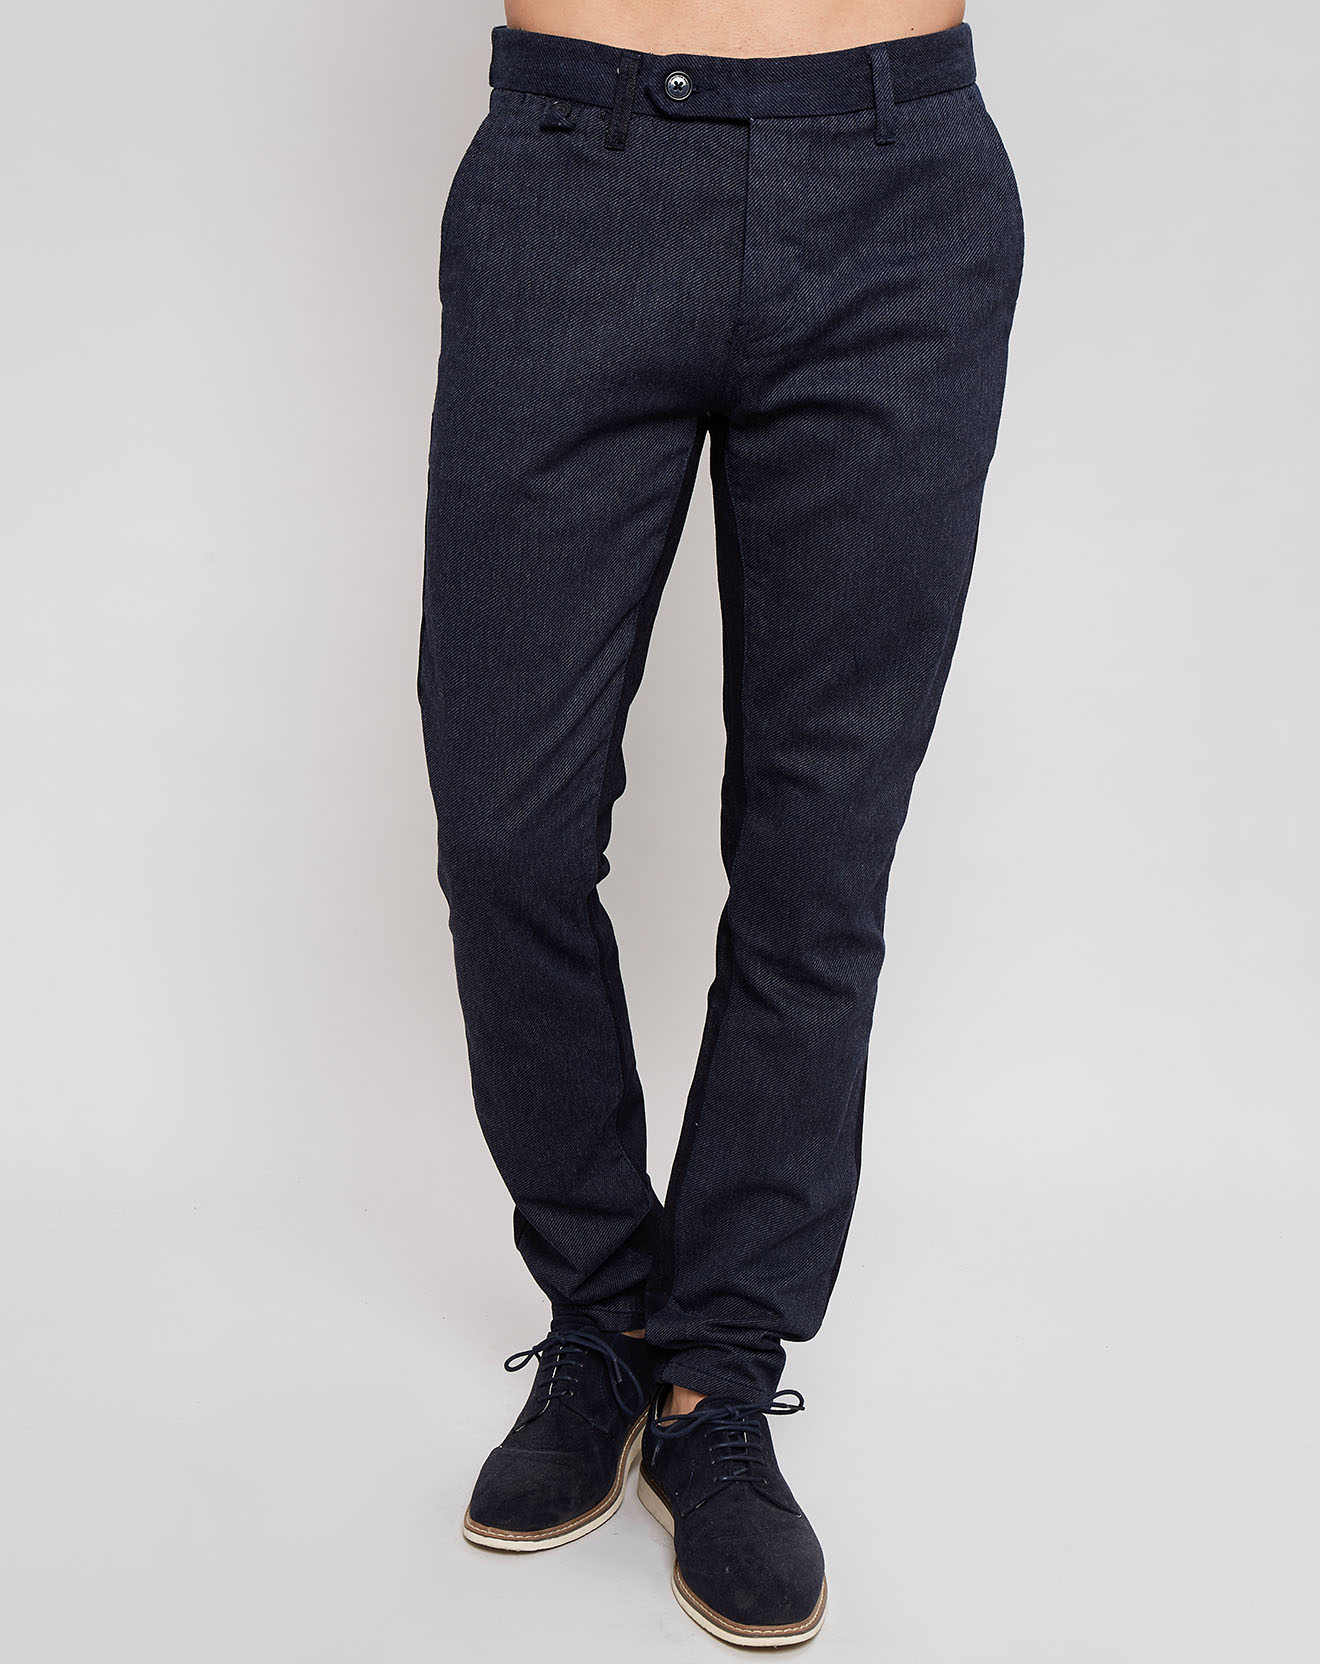 Pantalon chino Sloane Denim Mix bleu - Pepe Jeans - Modalova